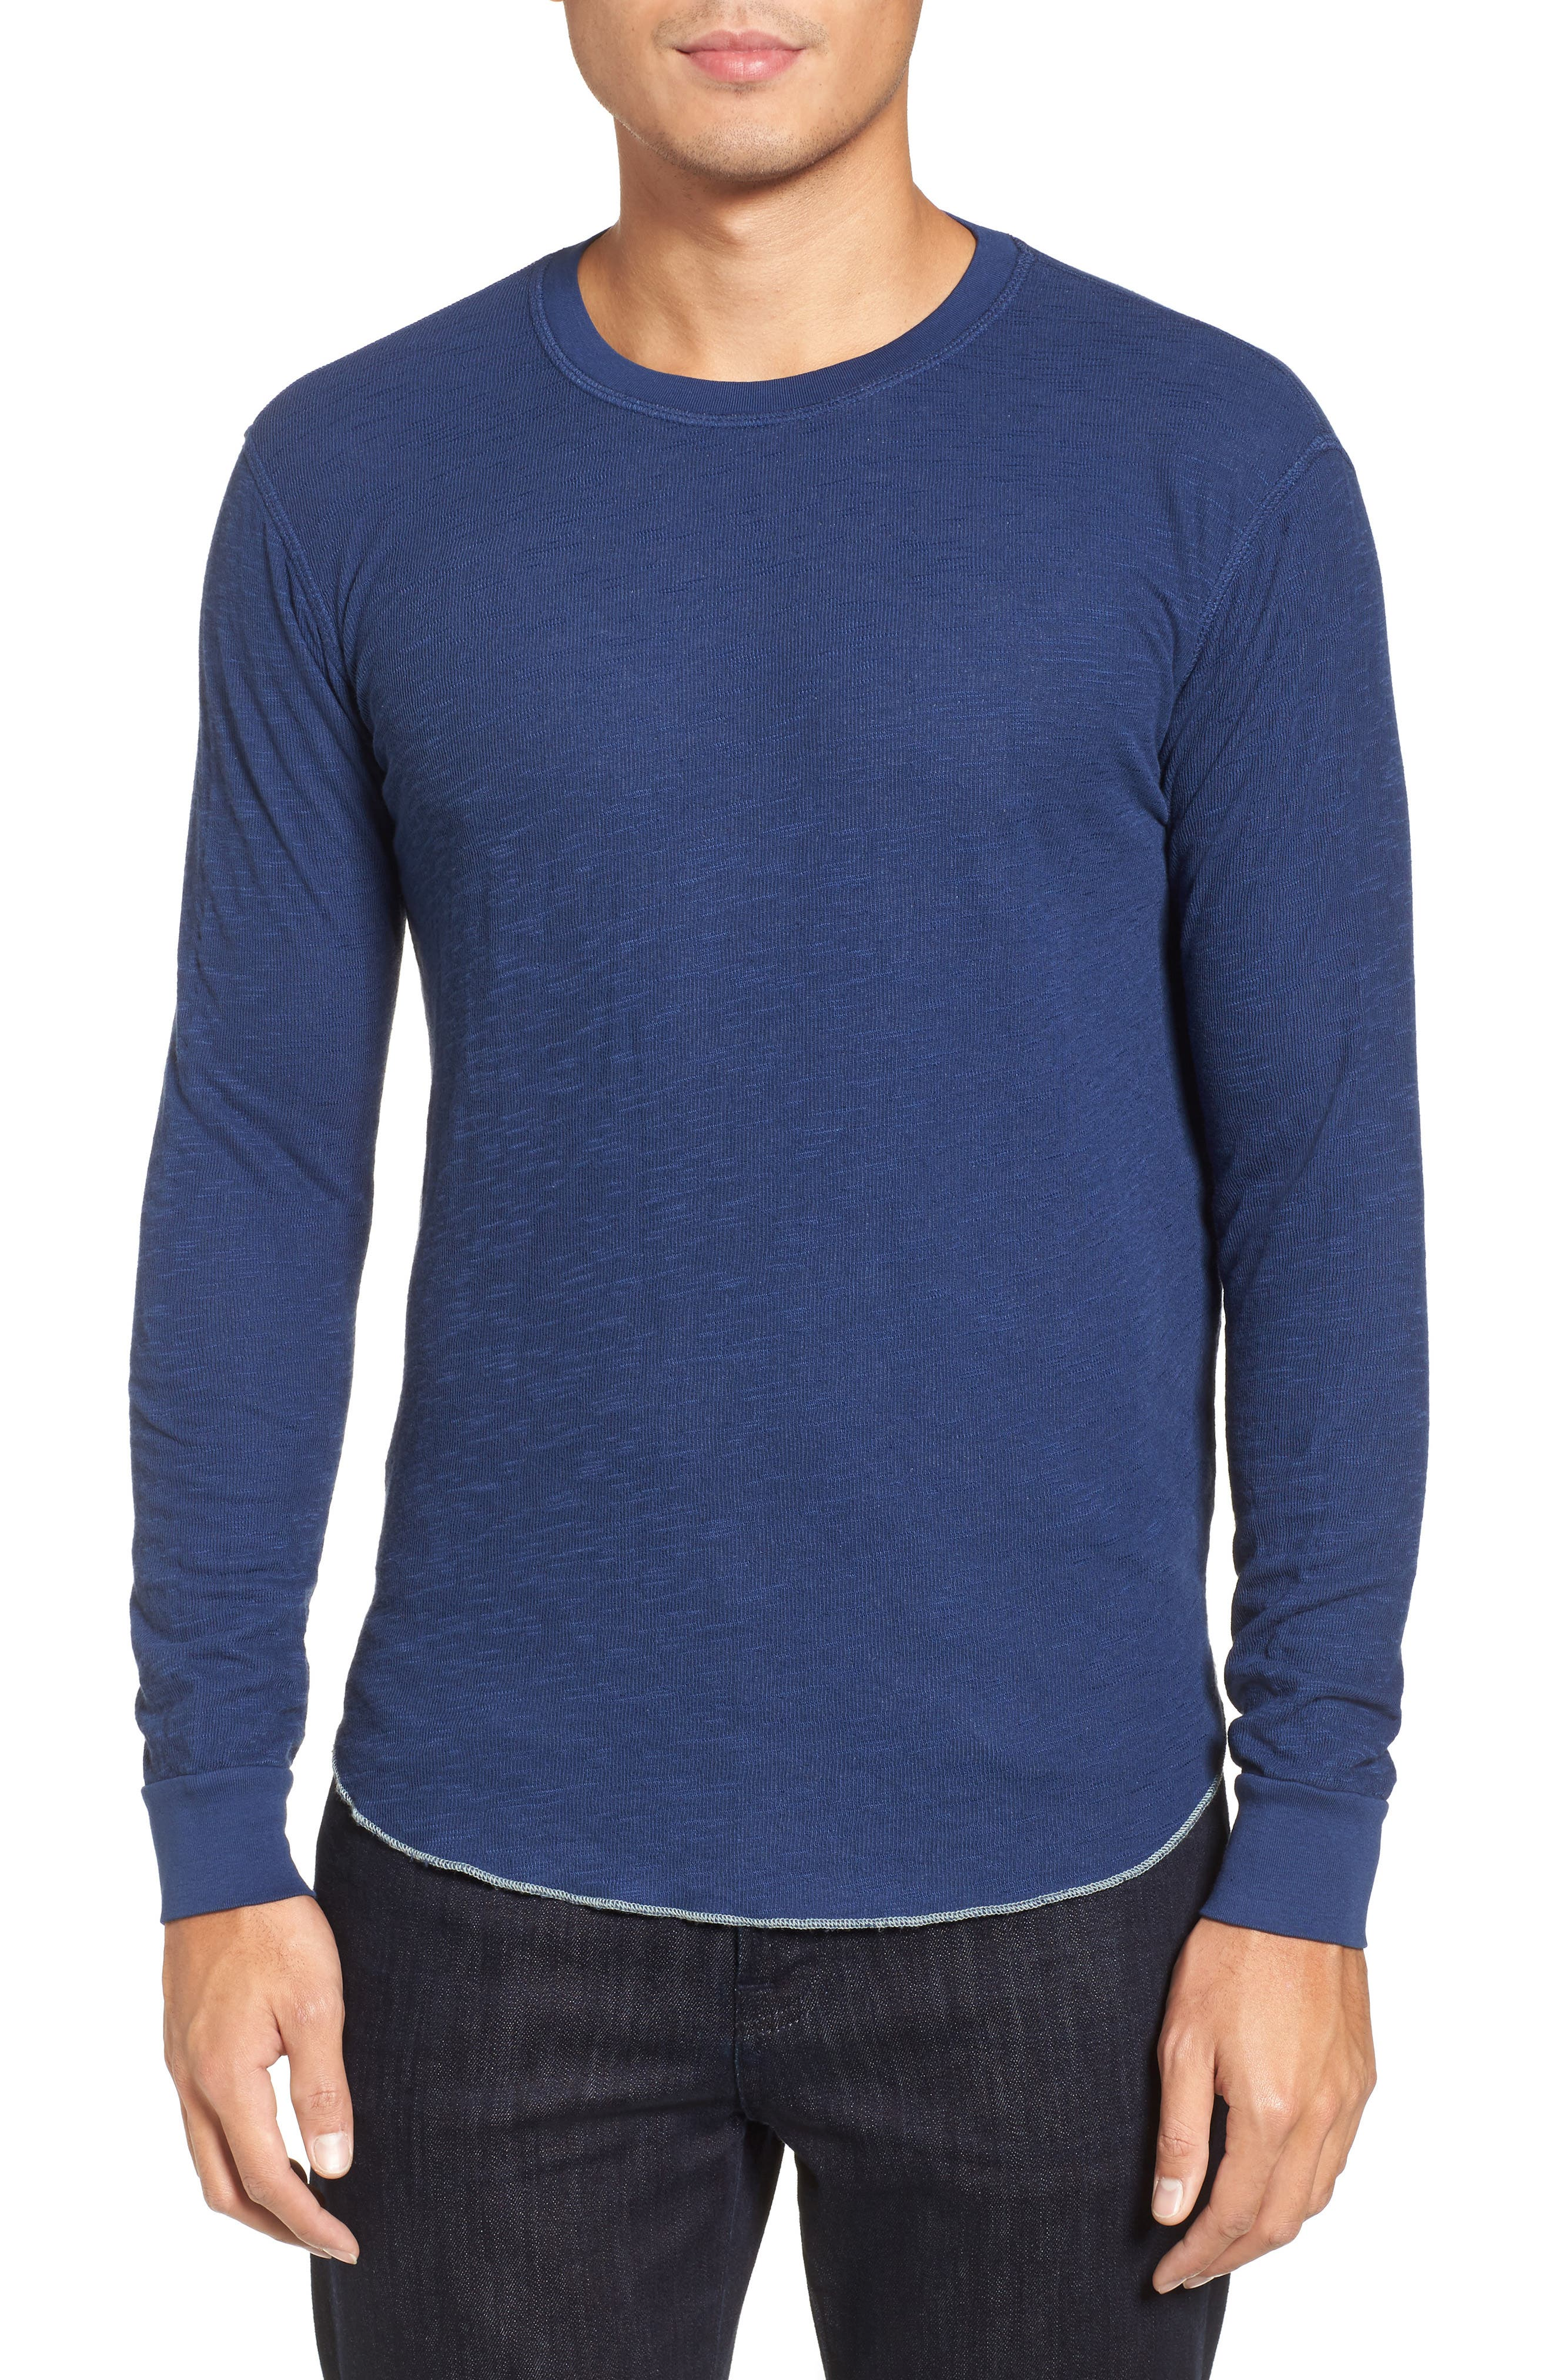 Alternate Image 1 Selected - Goodlife Double Layer Slim Crewneck T-Shirt